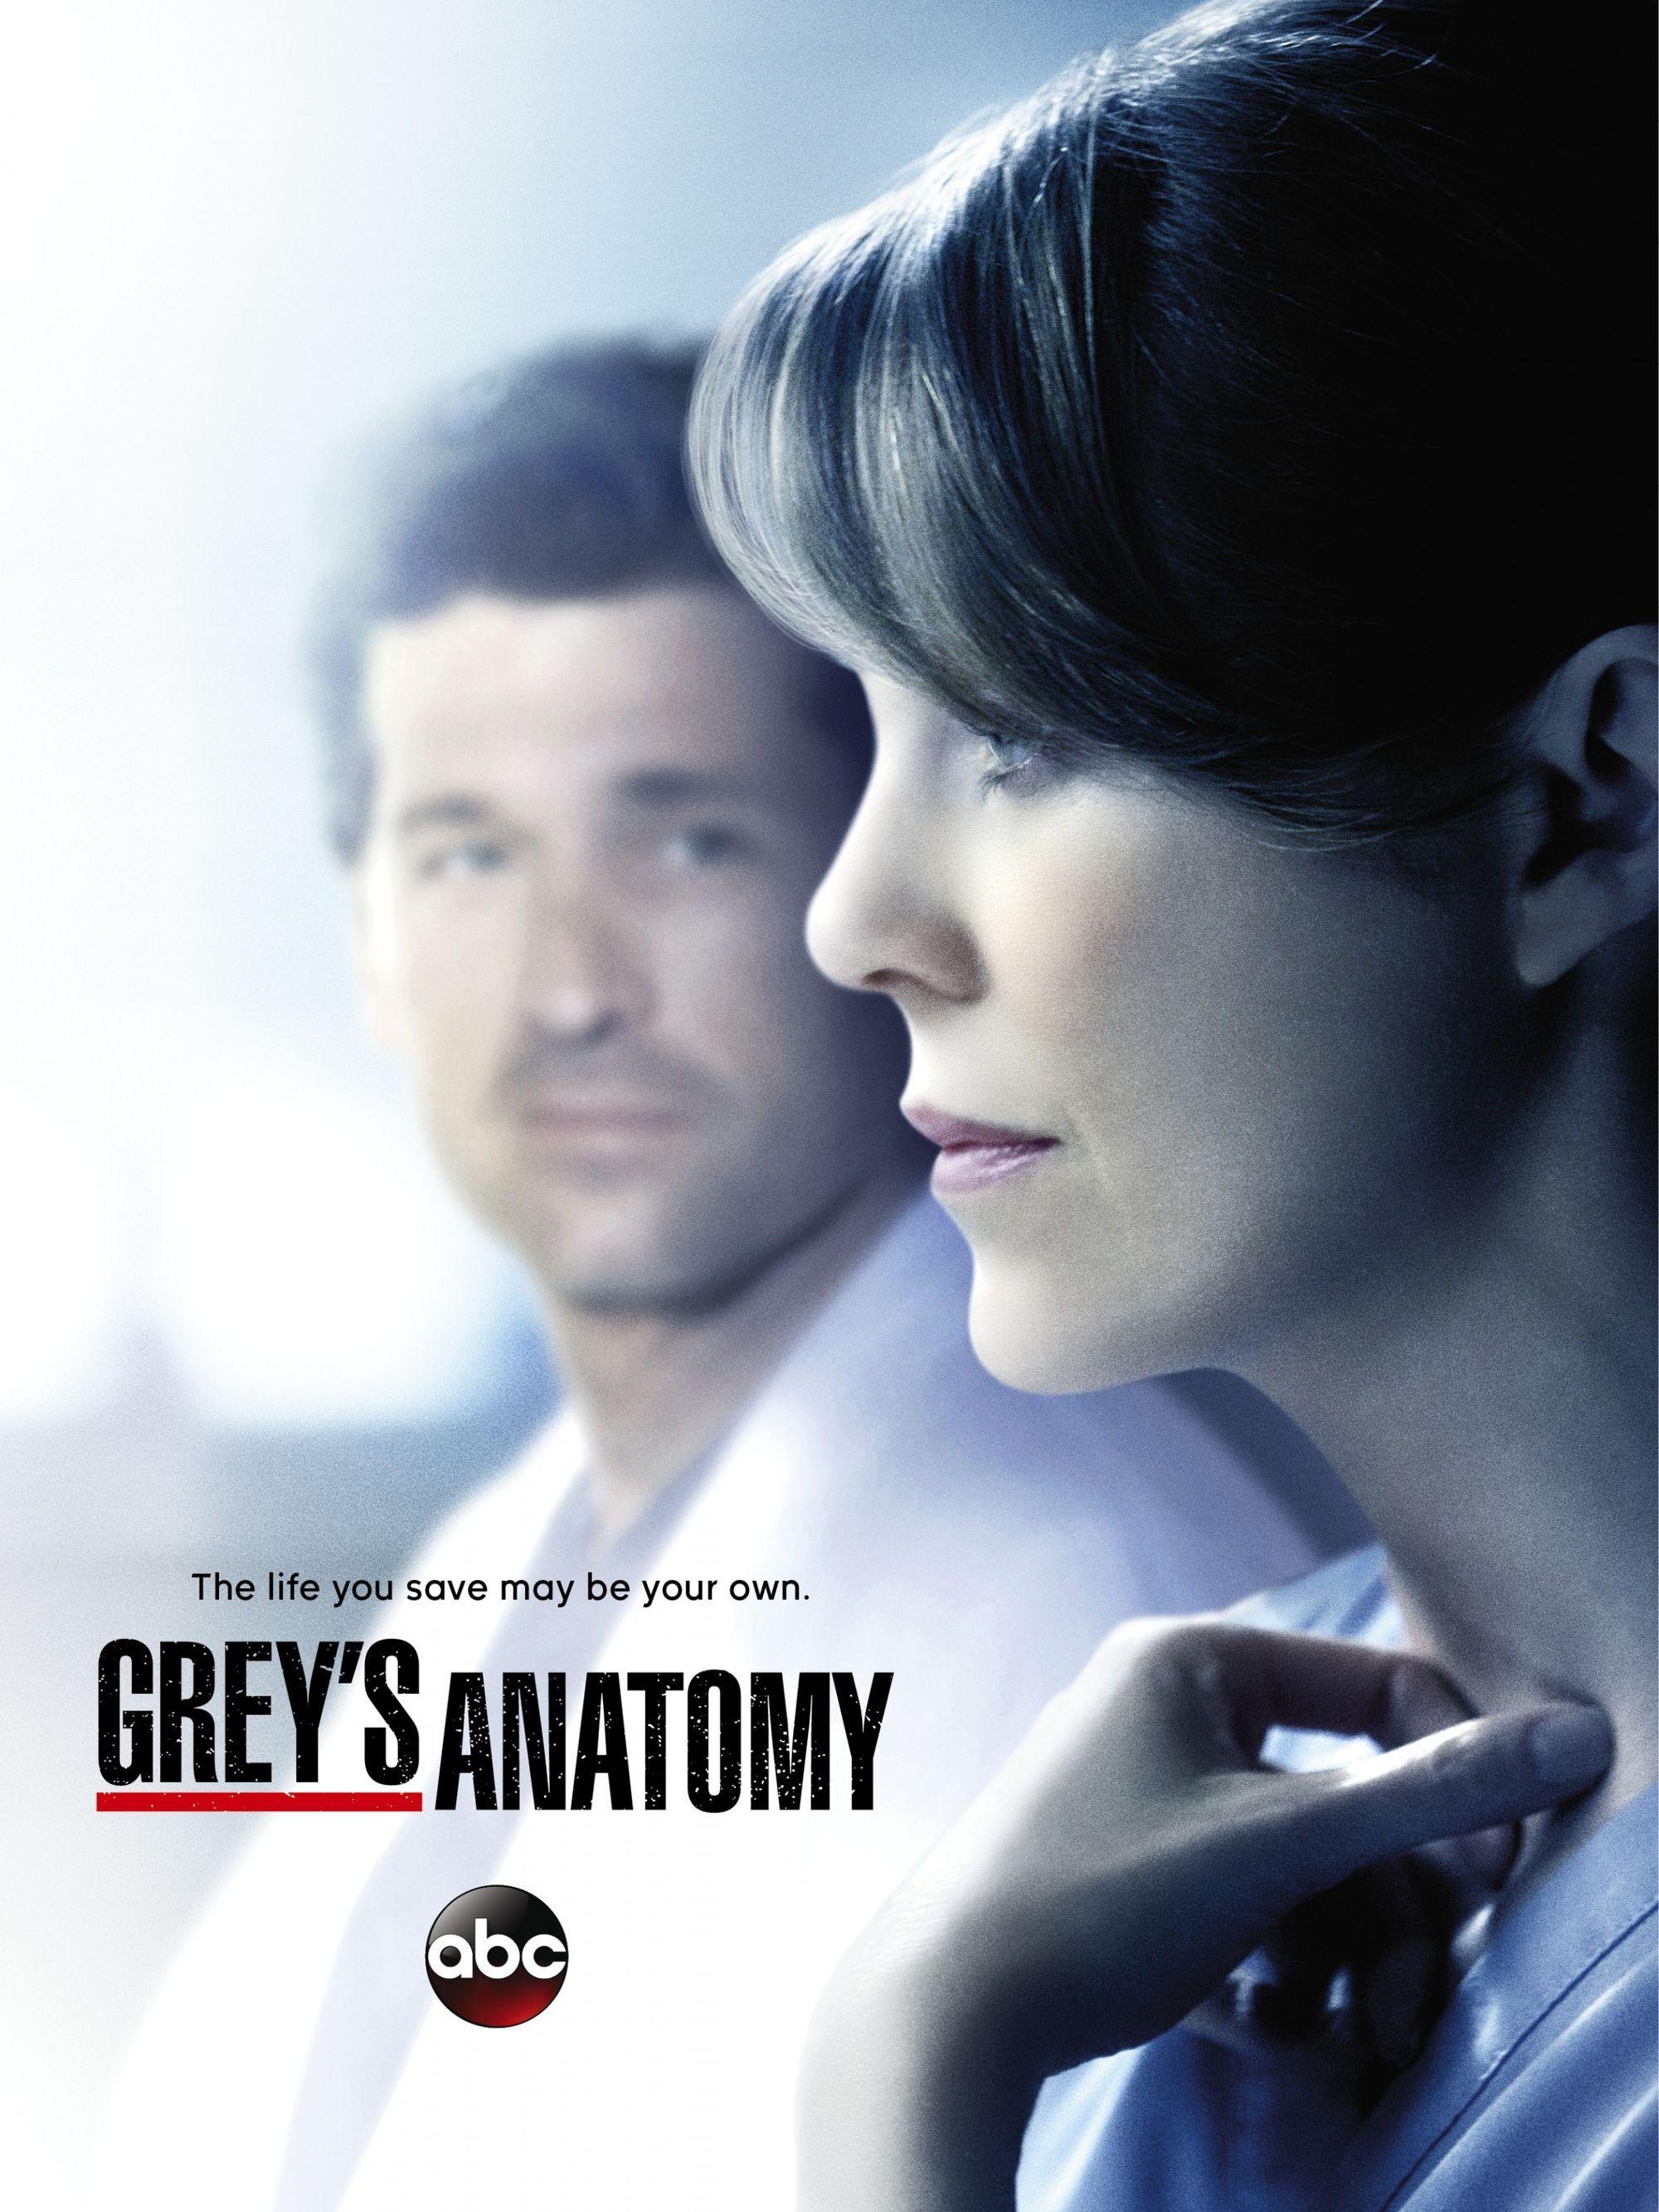 Greys Anatomy Season 11 Movies Tv Series Pinterest Grey